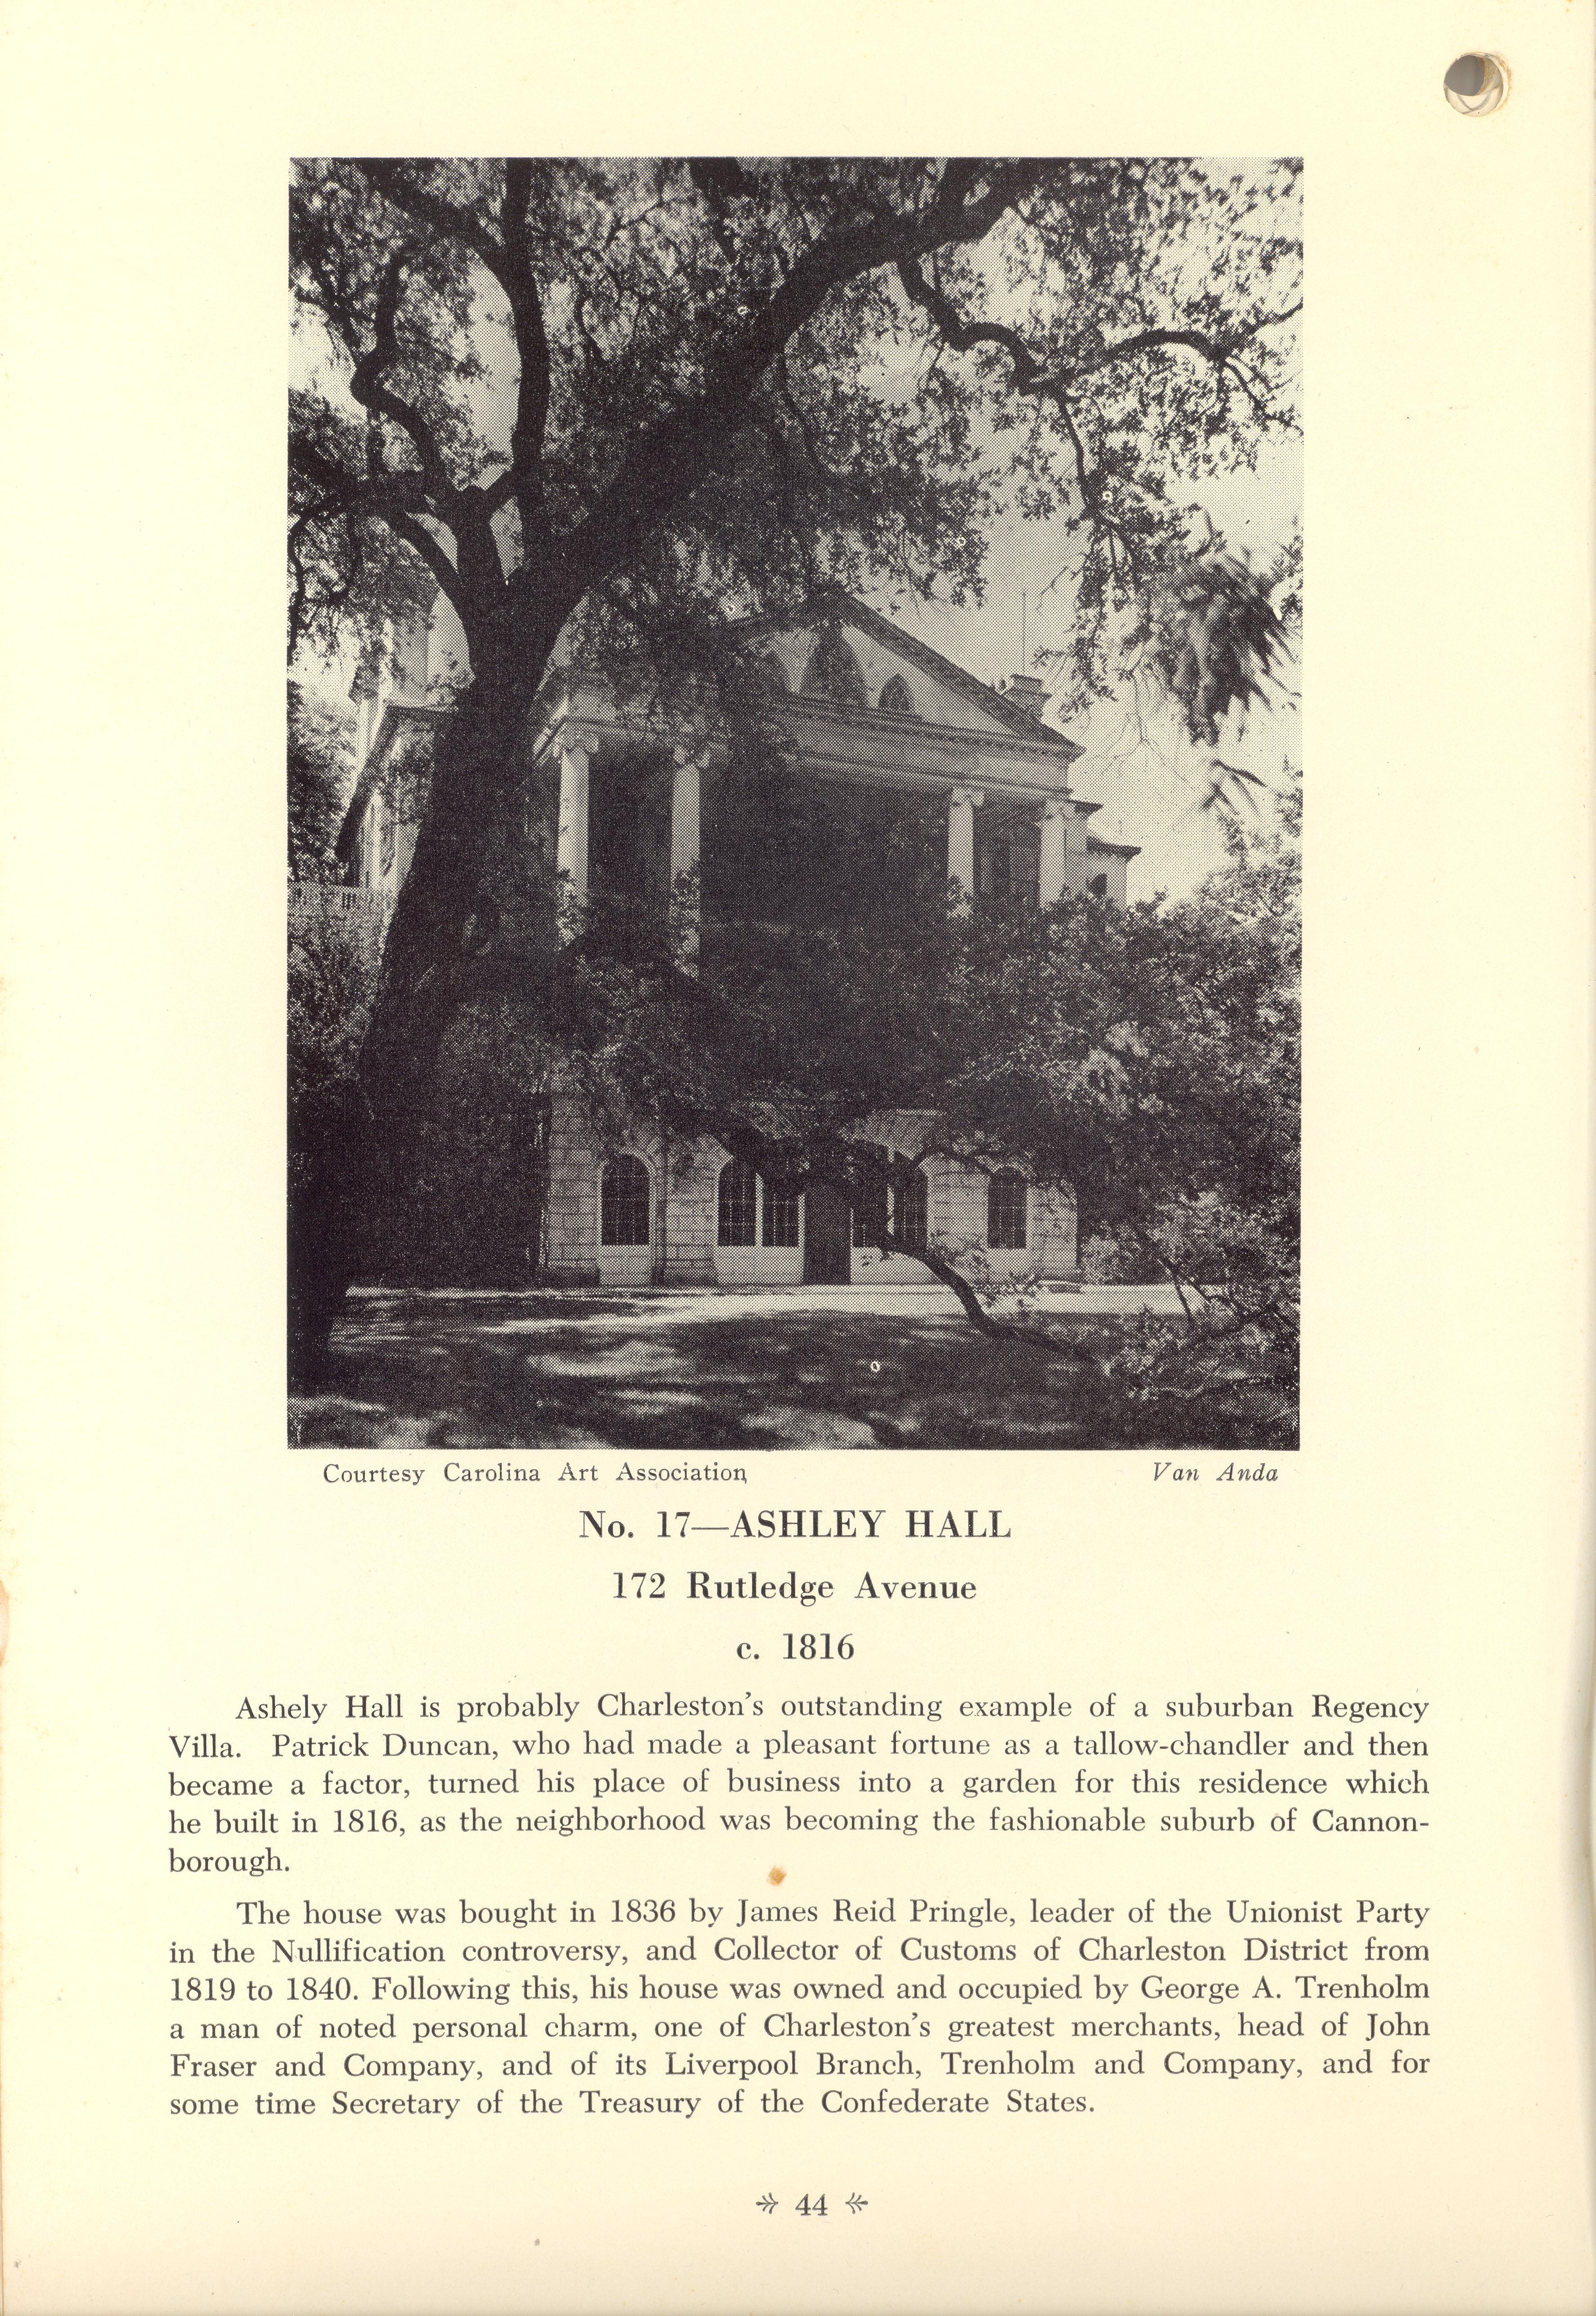 Page 44:  No. 17 - Ashley Hall, 172 Rutledge Avenue, c. 1816